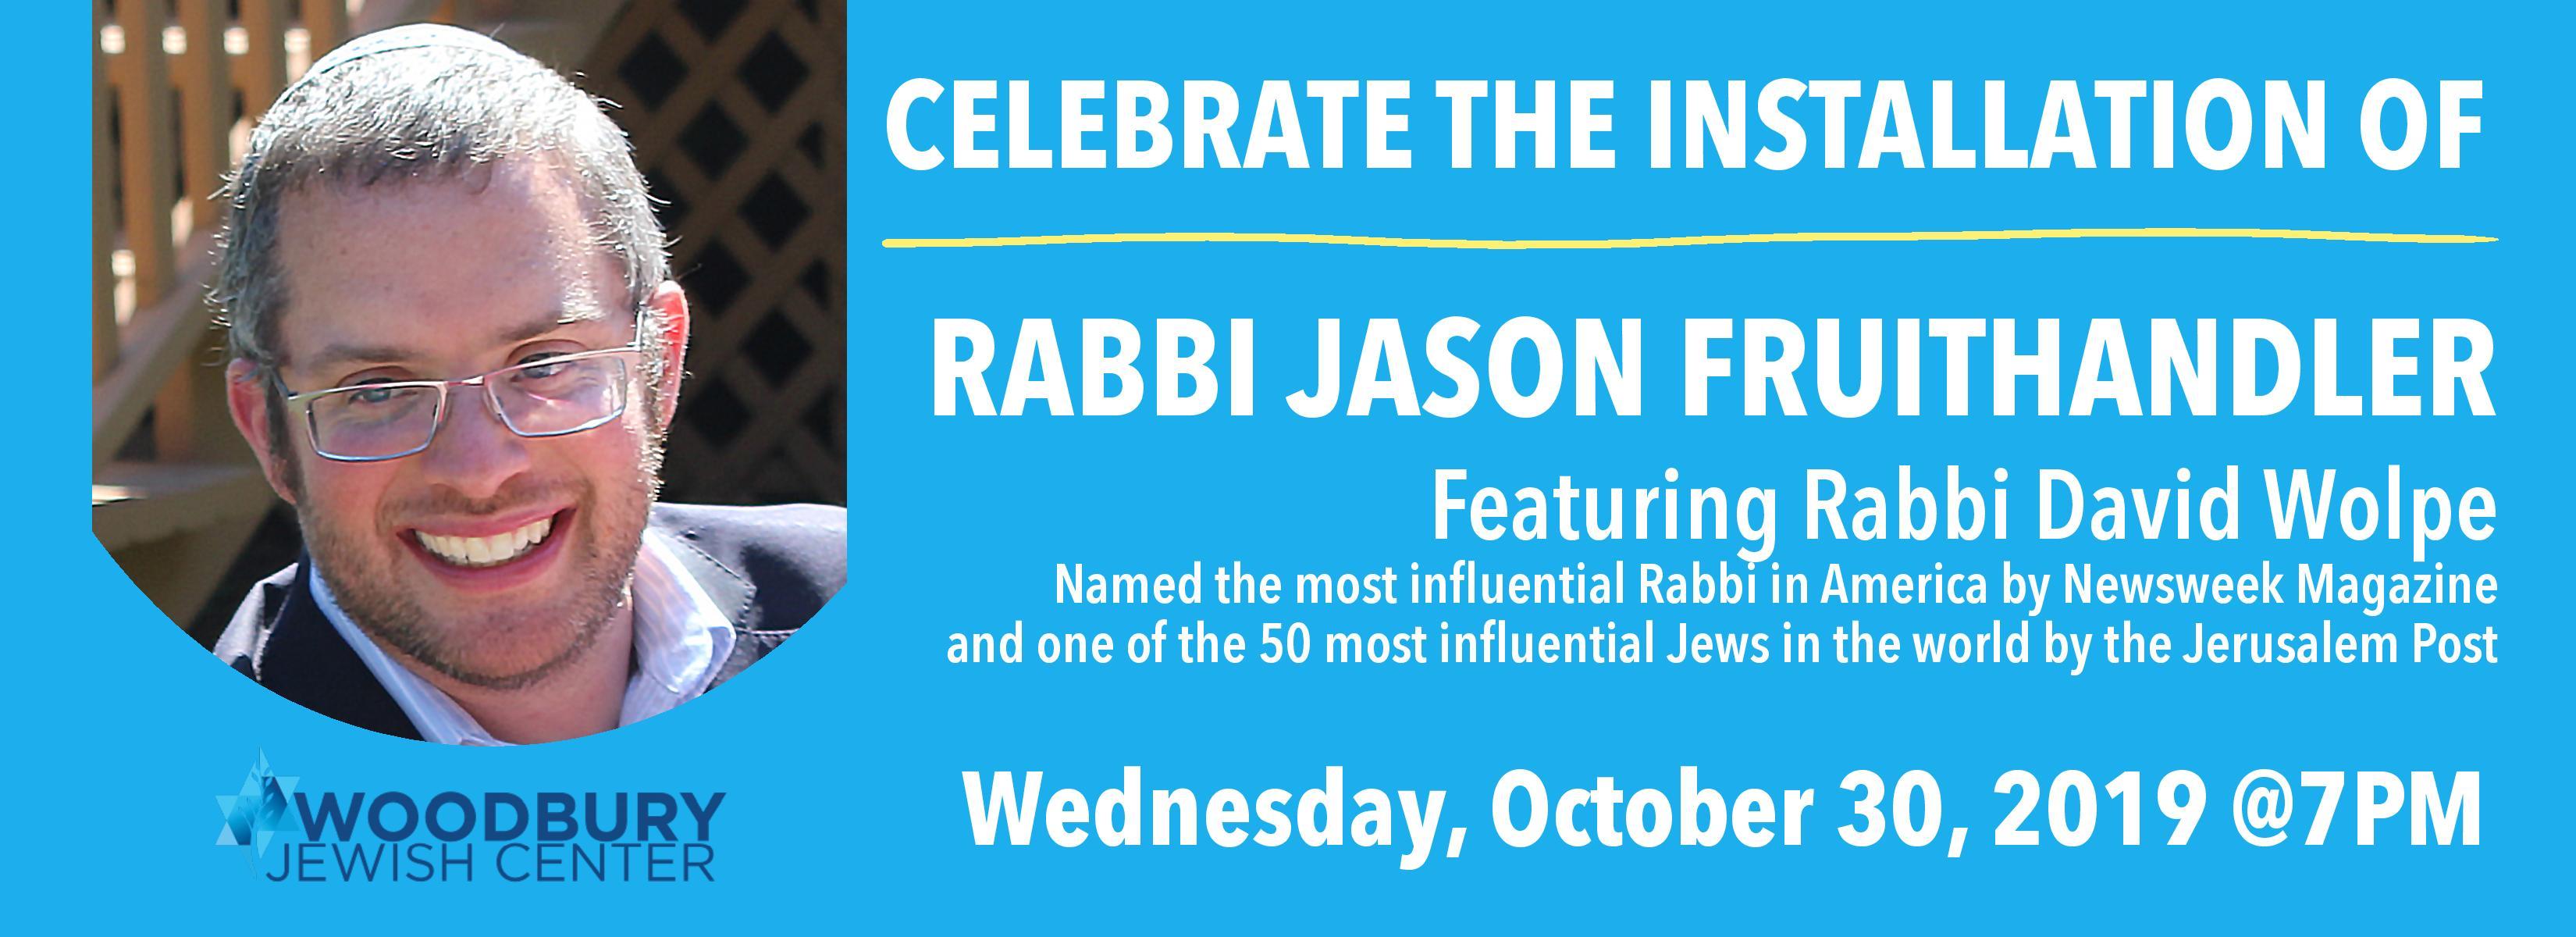 "<a href=""https://www.woodburyjc.org/event/rabbi-installation.html""                                     target="""">                                                                 <span class=""slider_title"">                                     SAVE THE DATE!                                </span>                                                                 </a>                                                                                                                                                                                       <span class=""slider_description"">Rabbi Fruithandler's Installation & Celebration</span>"